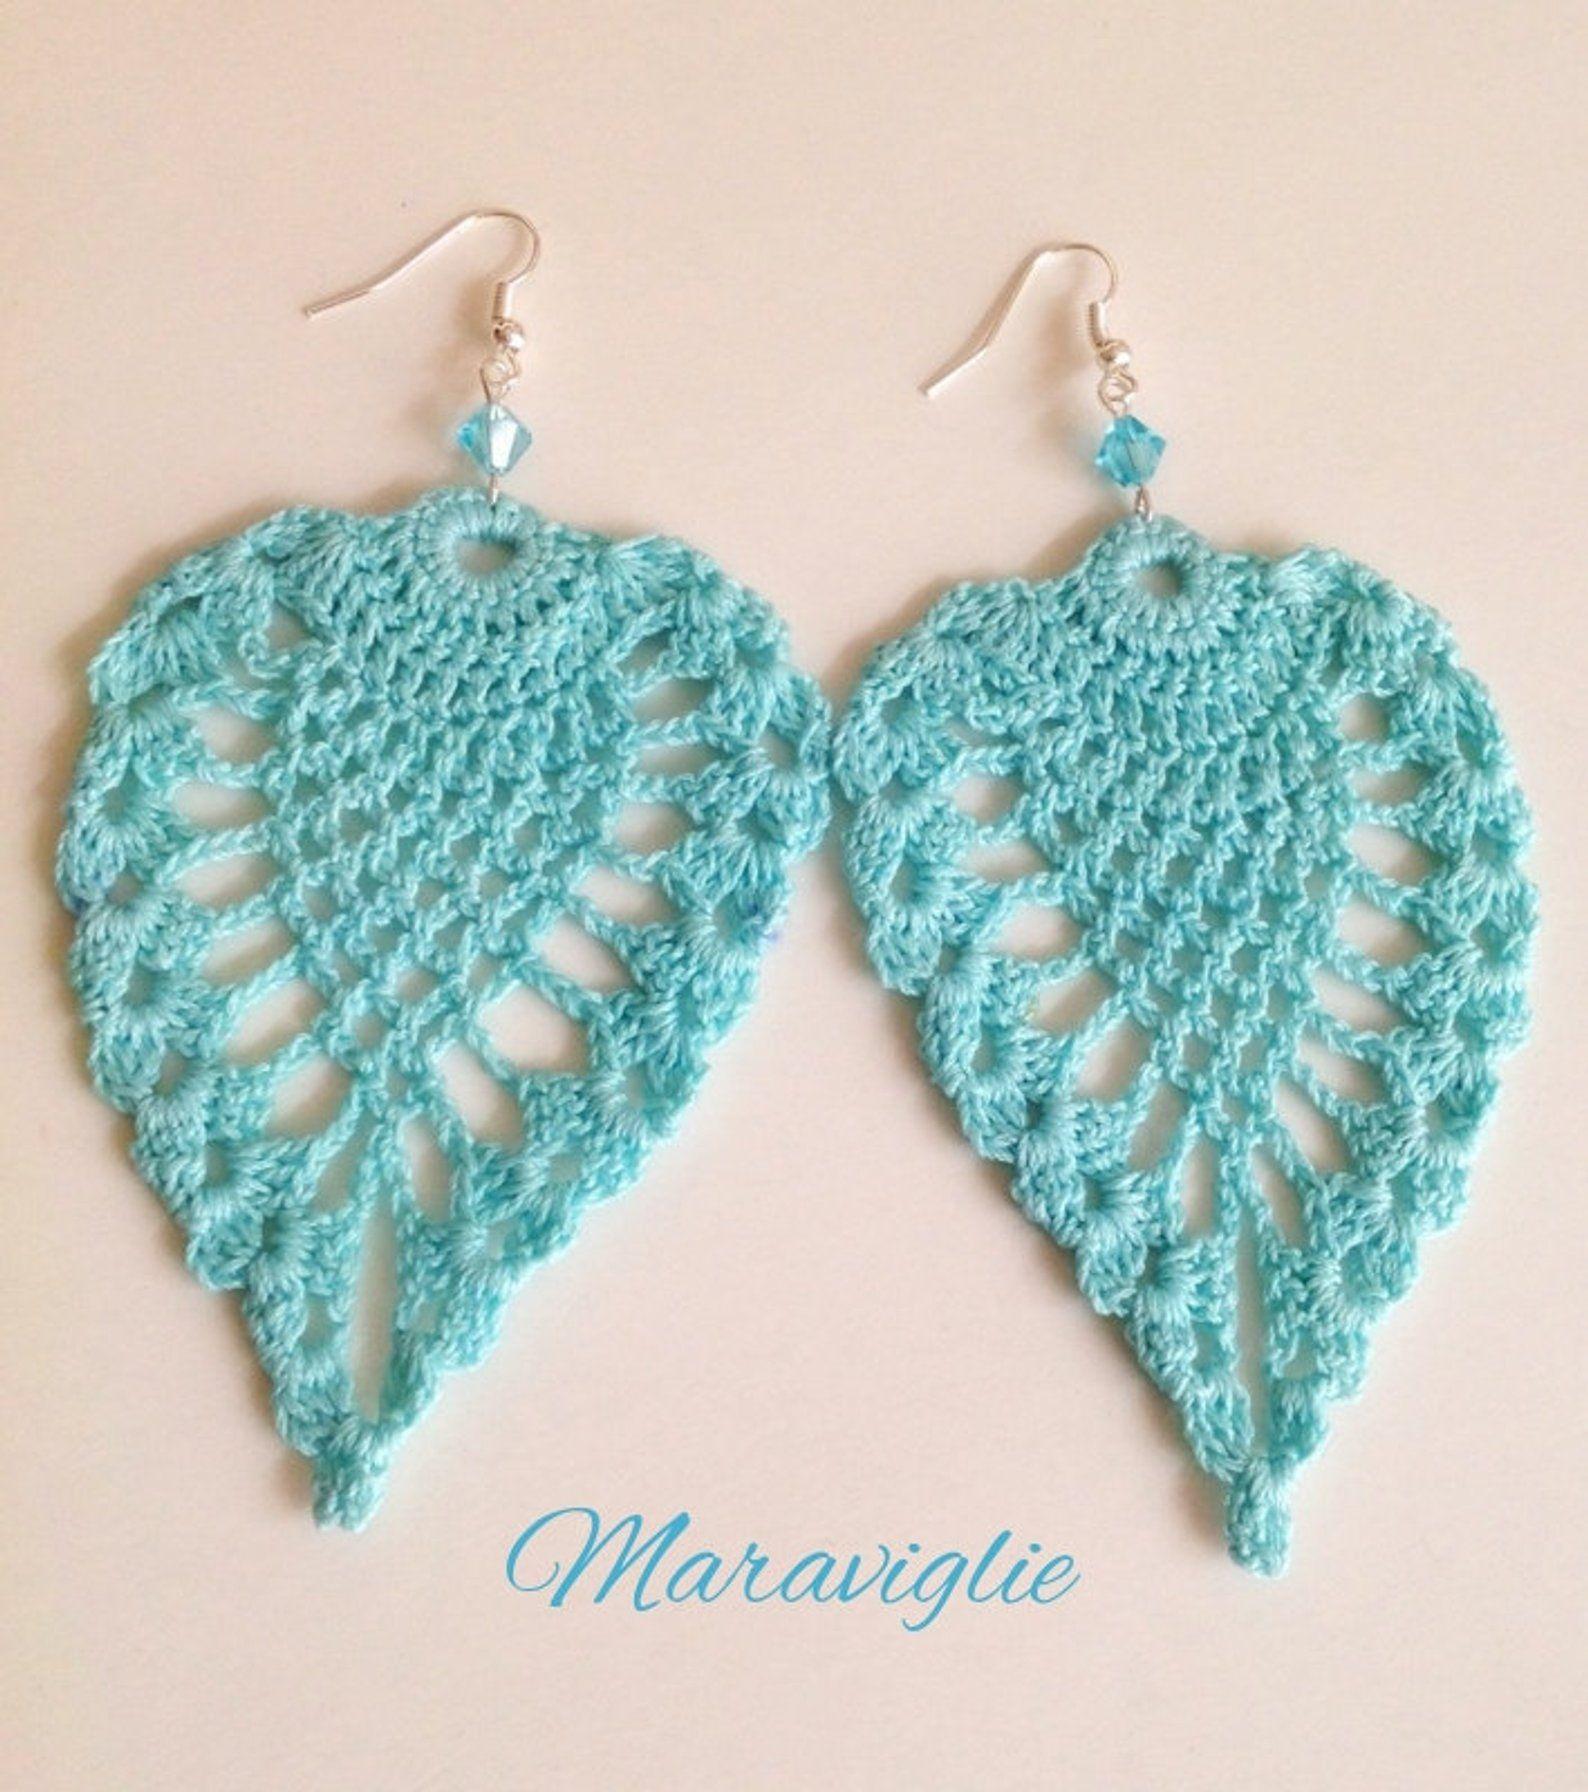 Stainless steel earrings hand-crocheted cotton flower